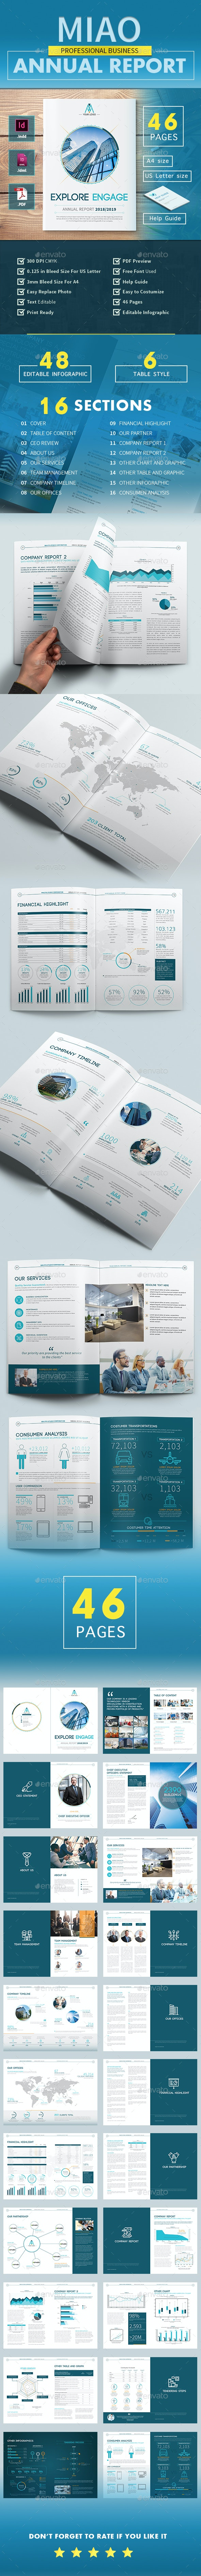 Annual Report - MIAO - Corporate Brochures